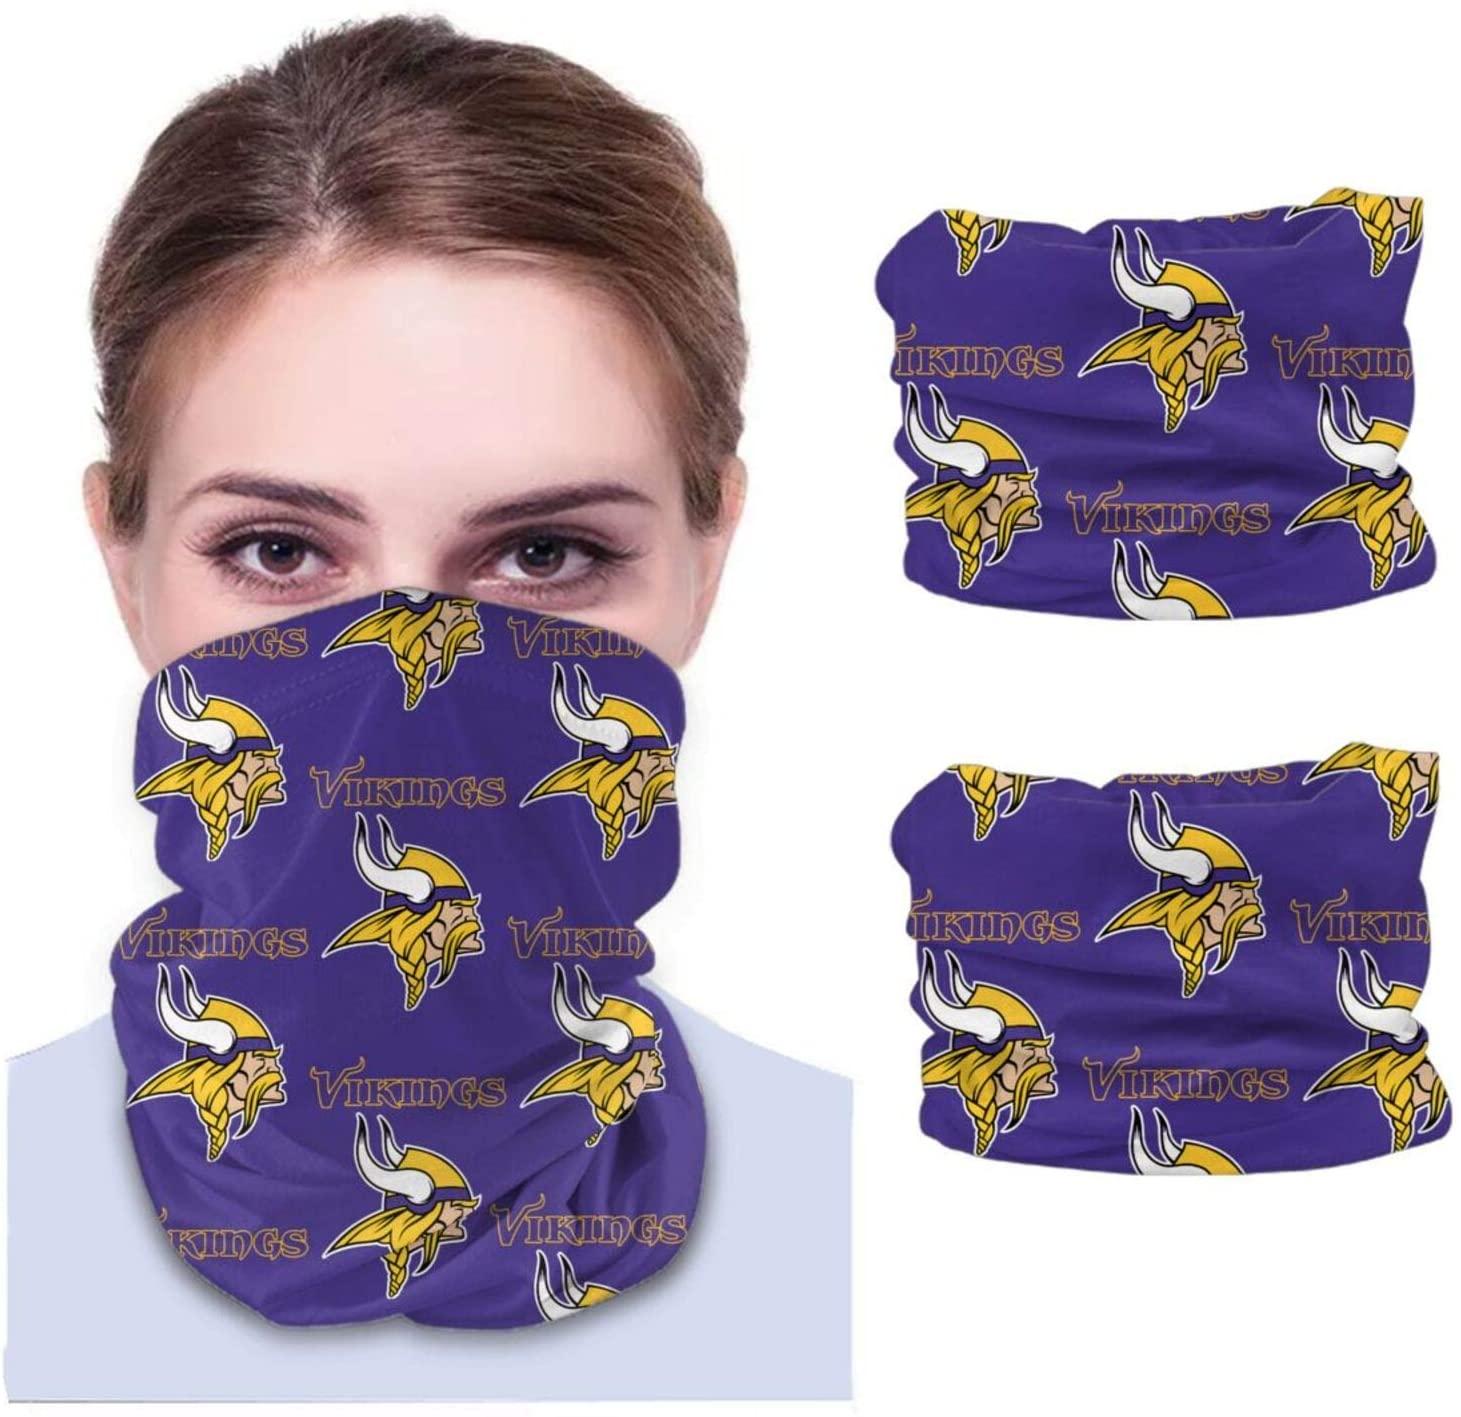 KANBGMTR Men and Women Minnesota-Vikings Bandanas, Neck Gaiter, Headwear, Magic Scarf, Headband for dust Sun Wind Unisex Balaclava Cap Face Shield (2 Pack)